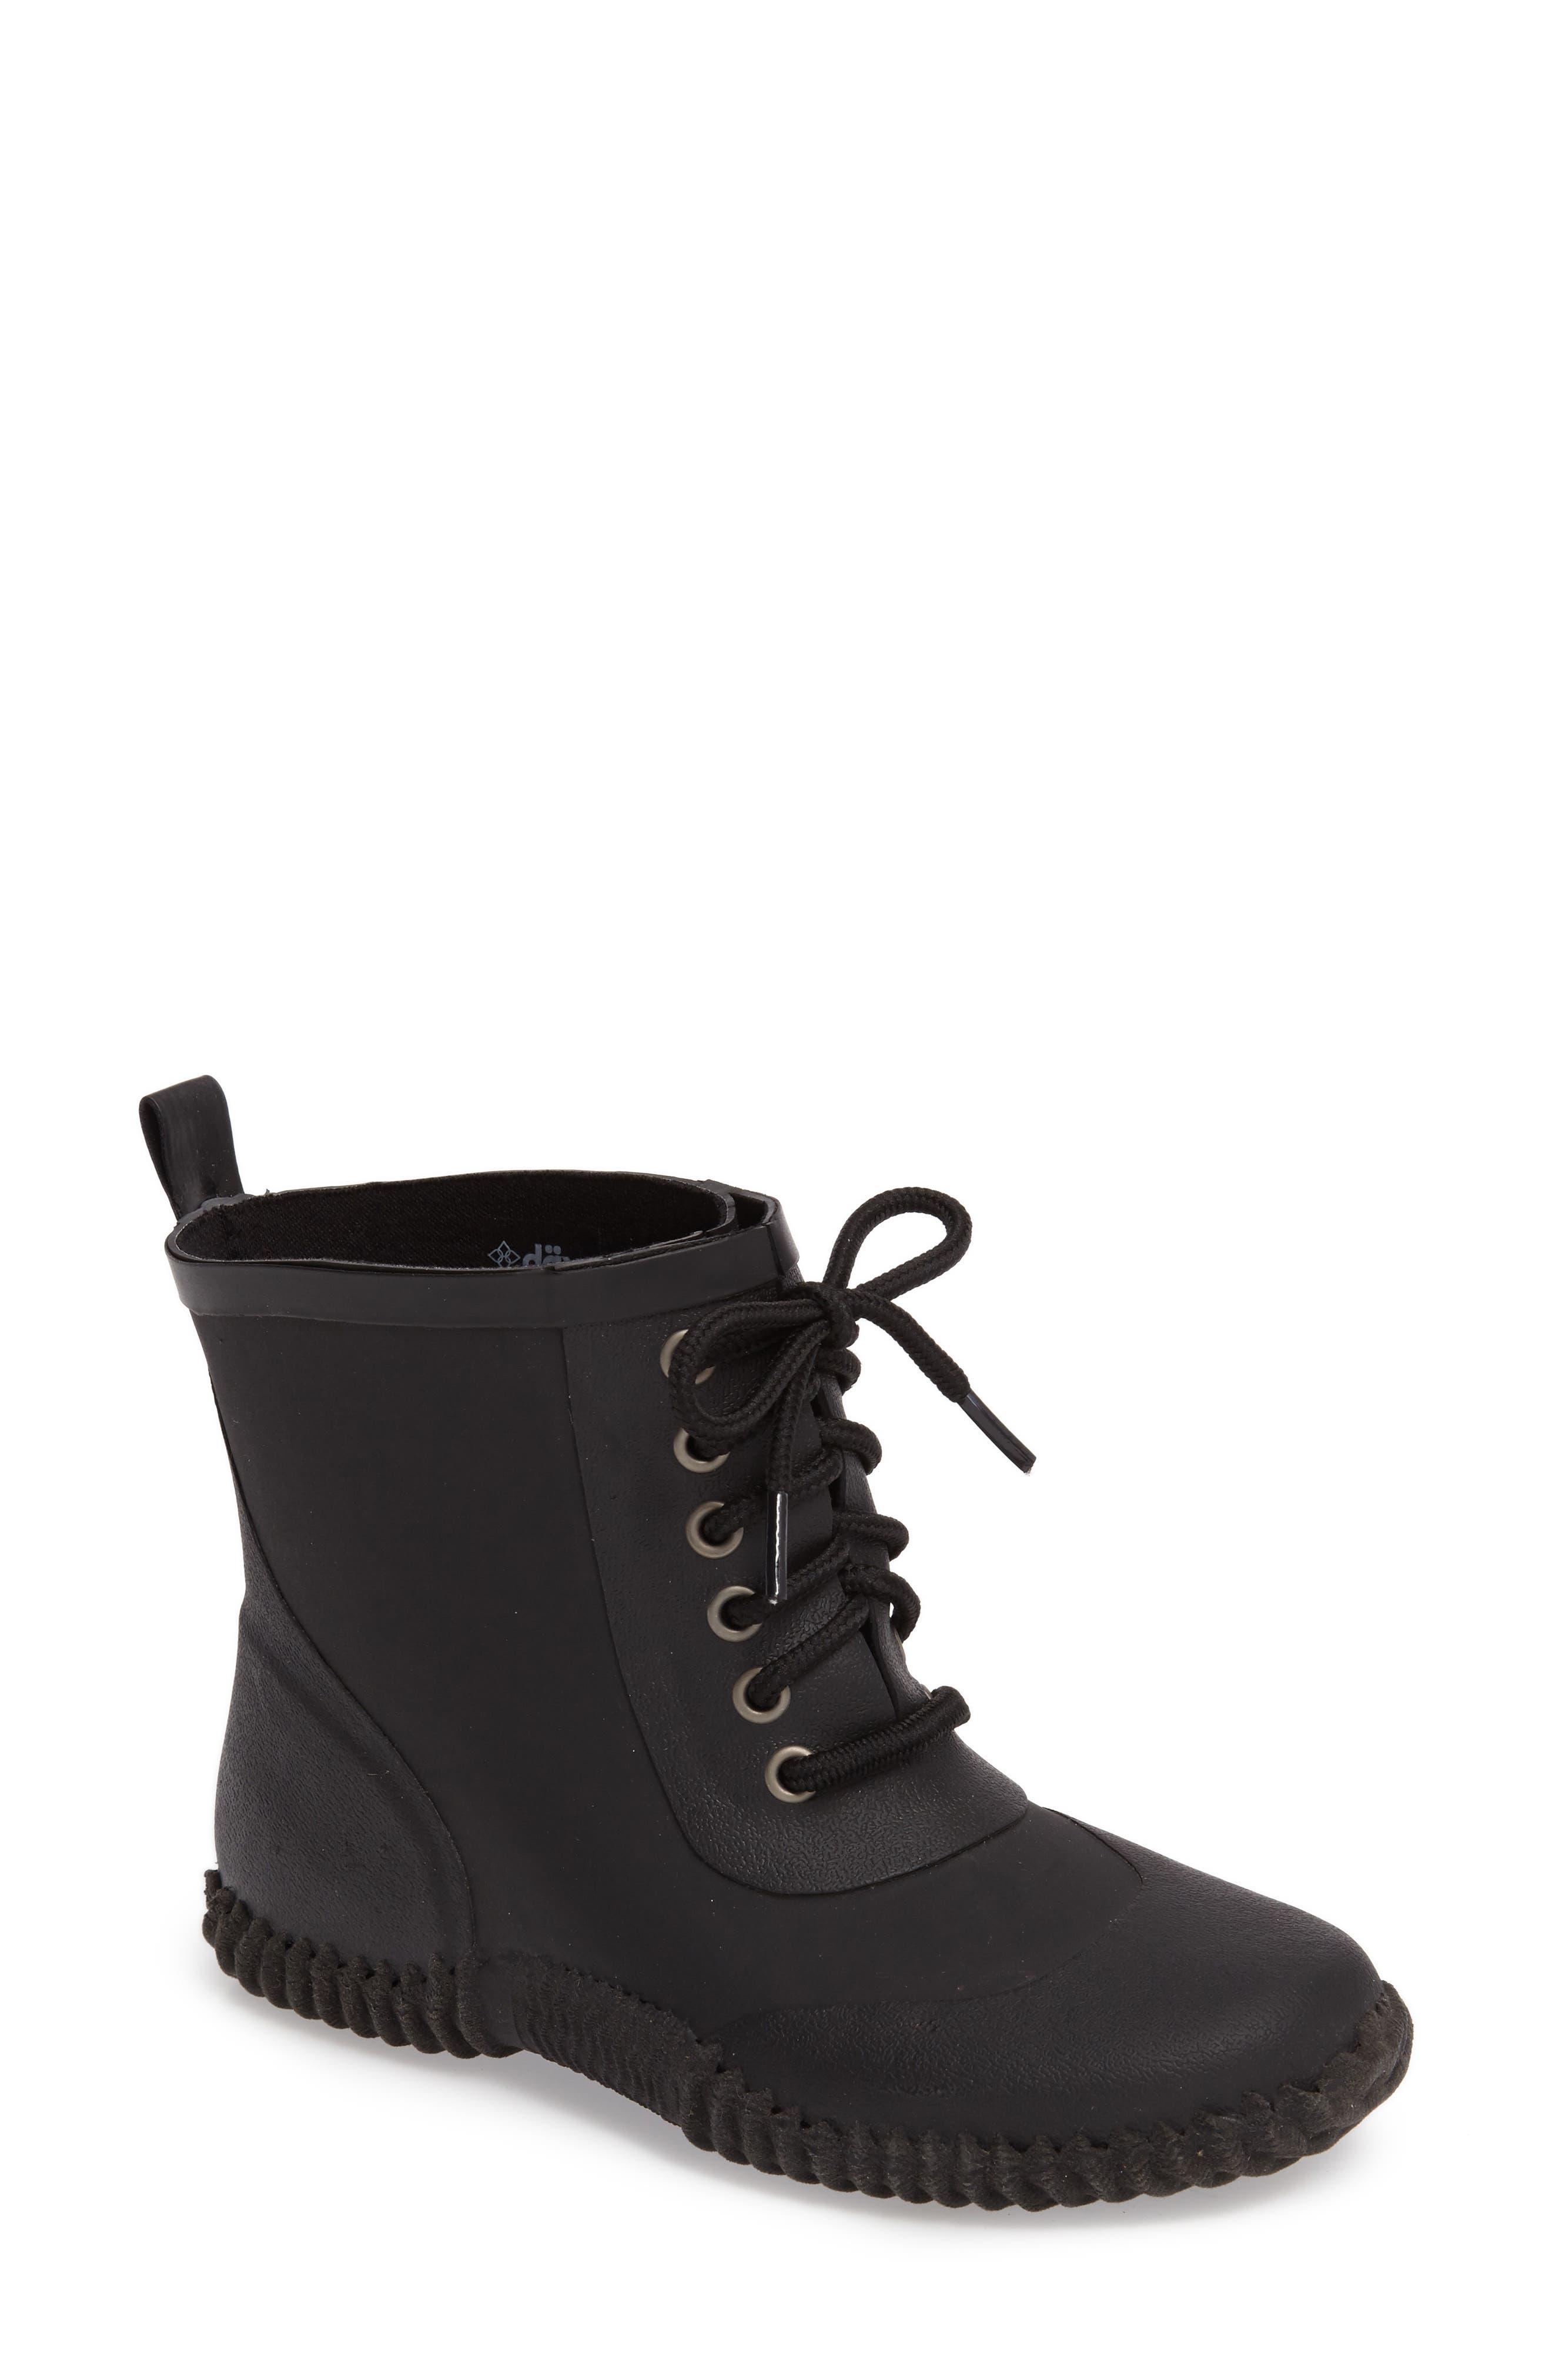 DÄV, Telluride Waterproof Rain Boot, Main thumbnail 1, color, BLACK